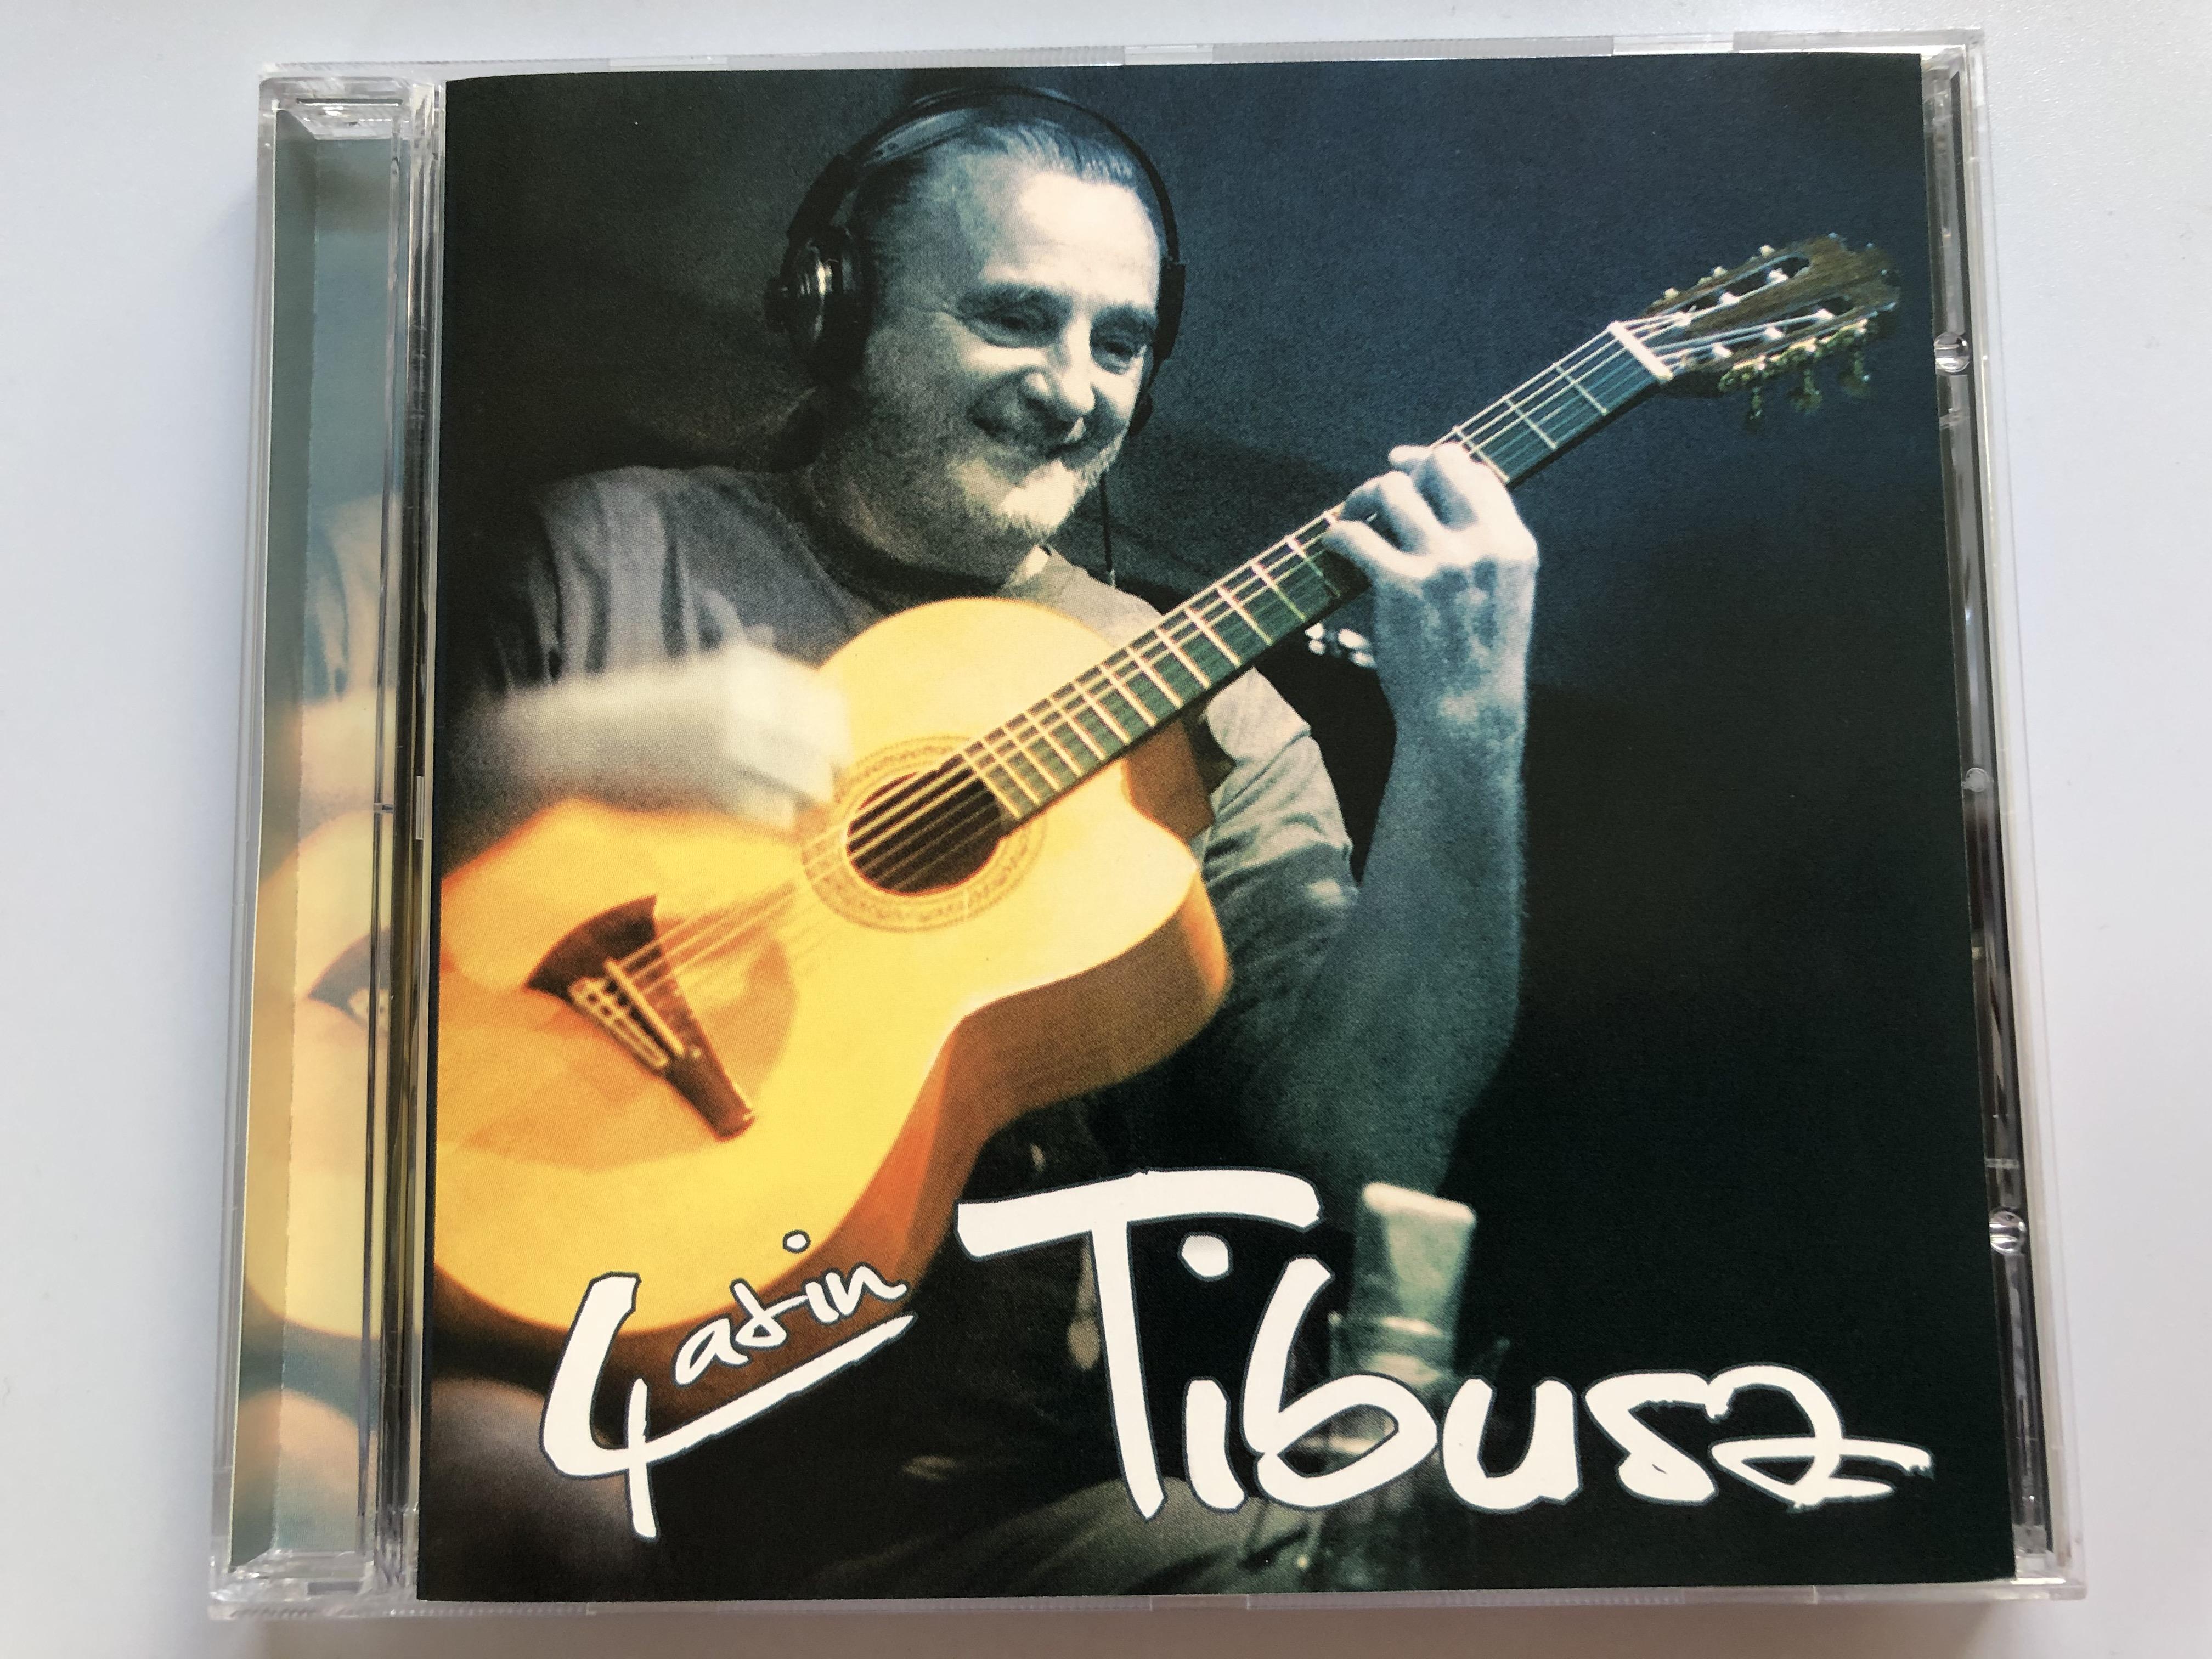 tibusz-4-latin-audio-cd-2007-bh-010-1-.jpg